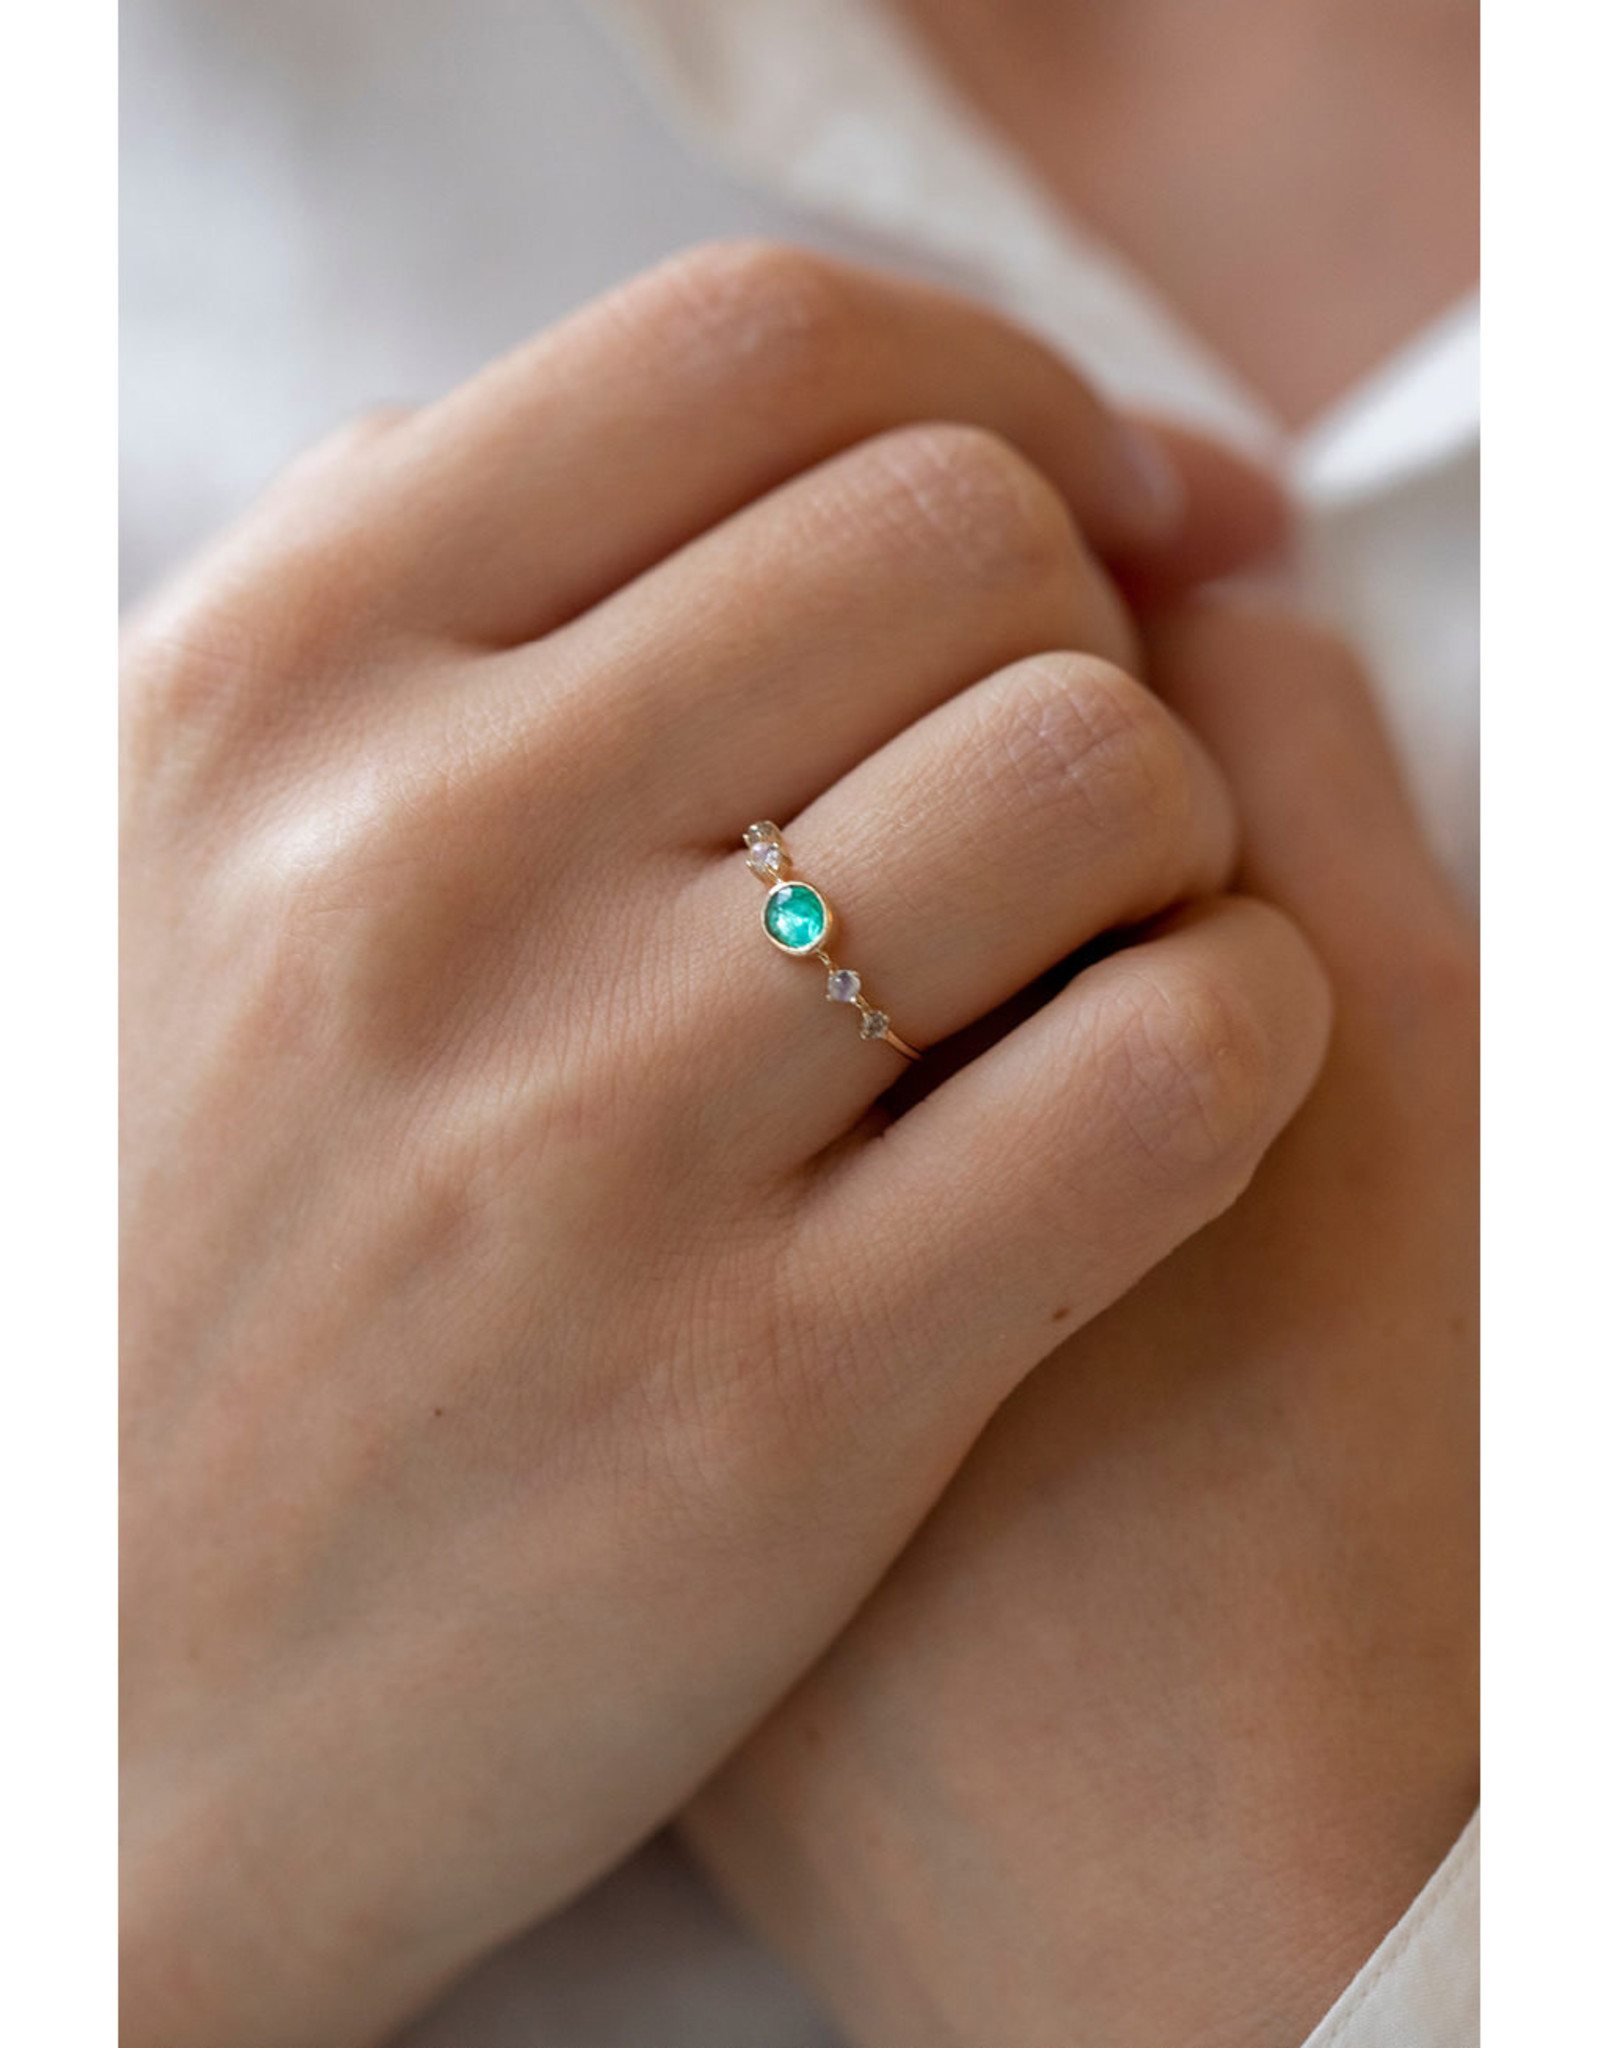 Celine Daoust Vivid Green Emerald + Moonstone + Diamonds Ring